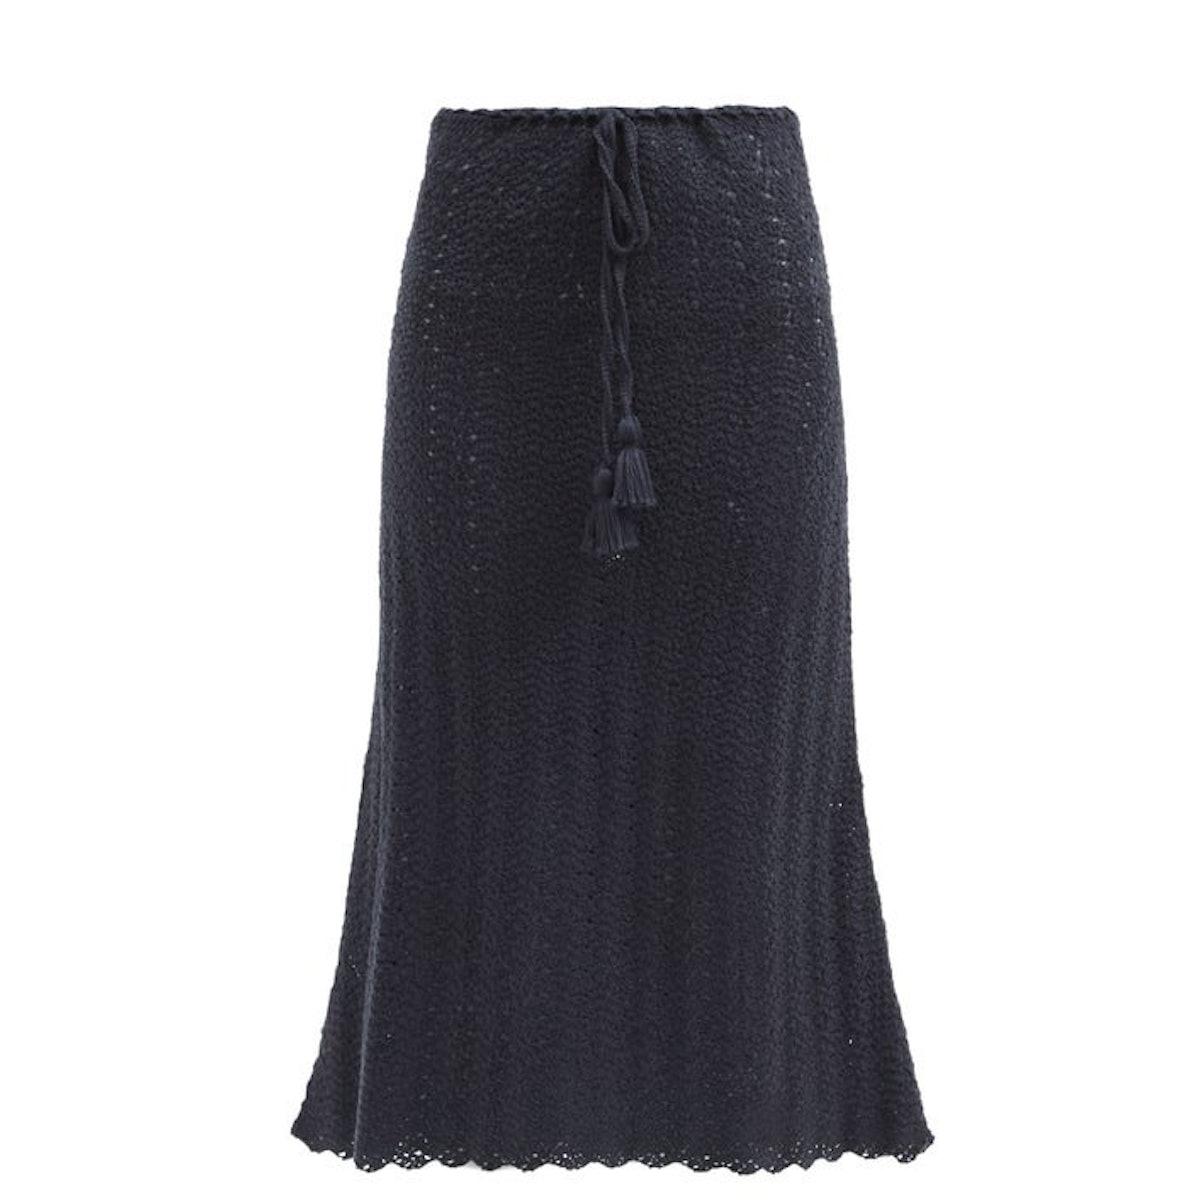 ESCVDO Tarma crocheted Pima-cotton midi skirt